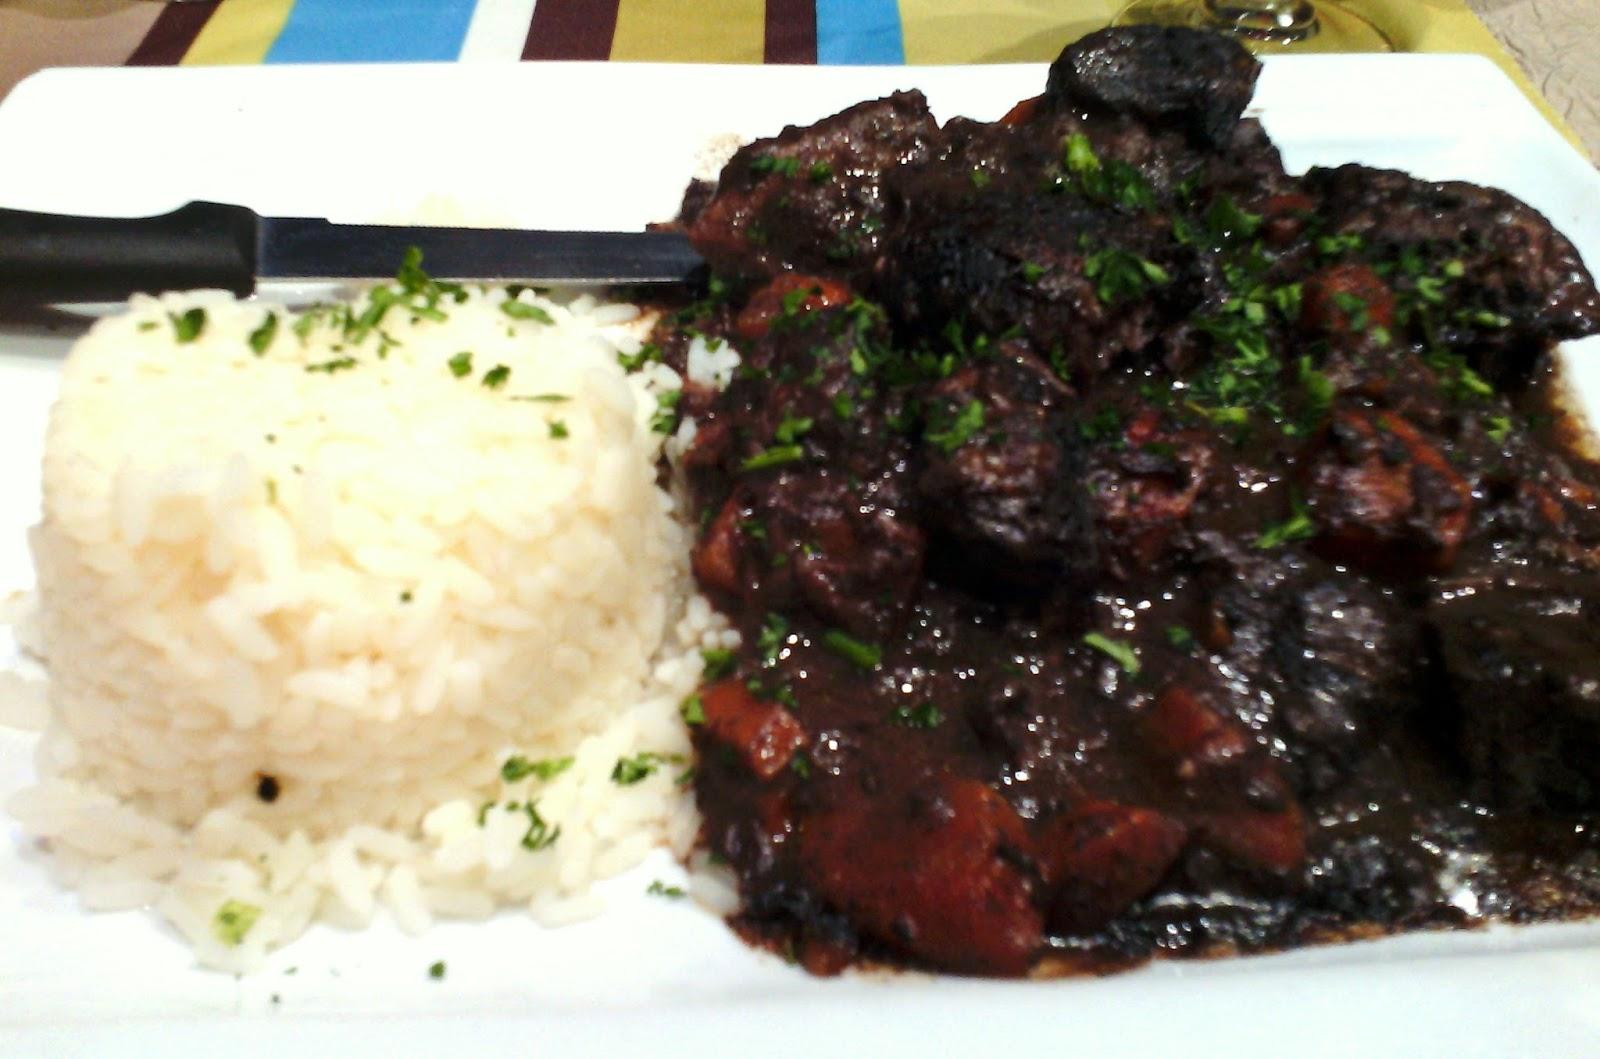 guardiane de boeuf - beef gardiane recipe - camargue recipe